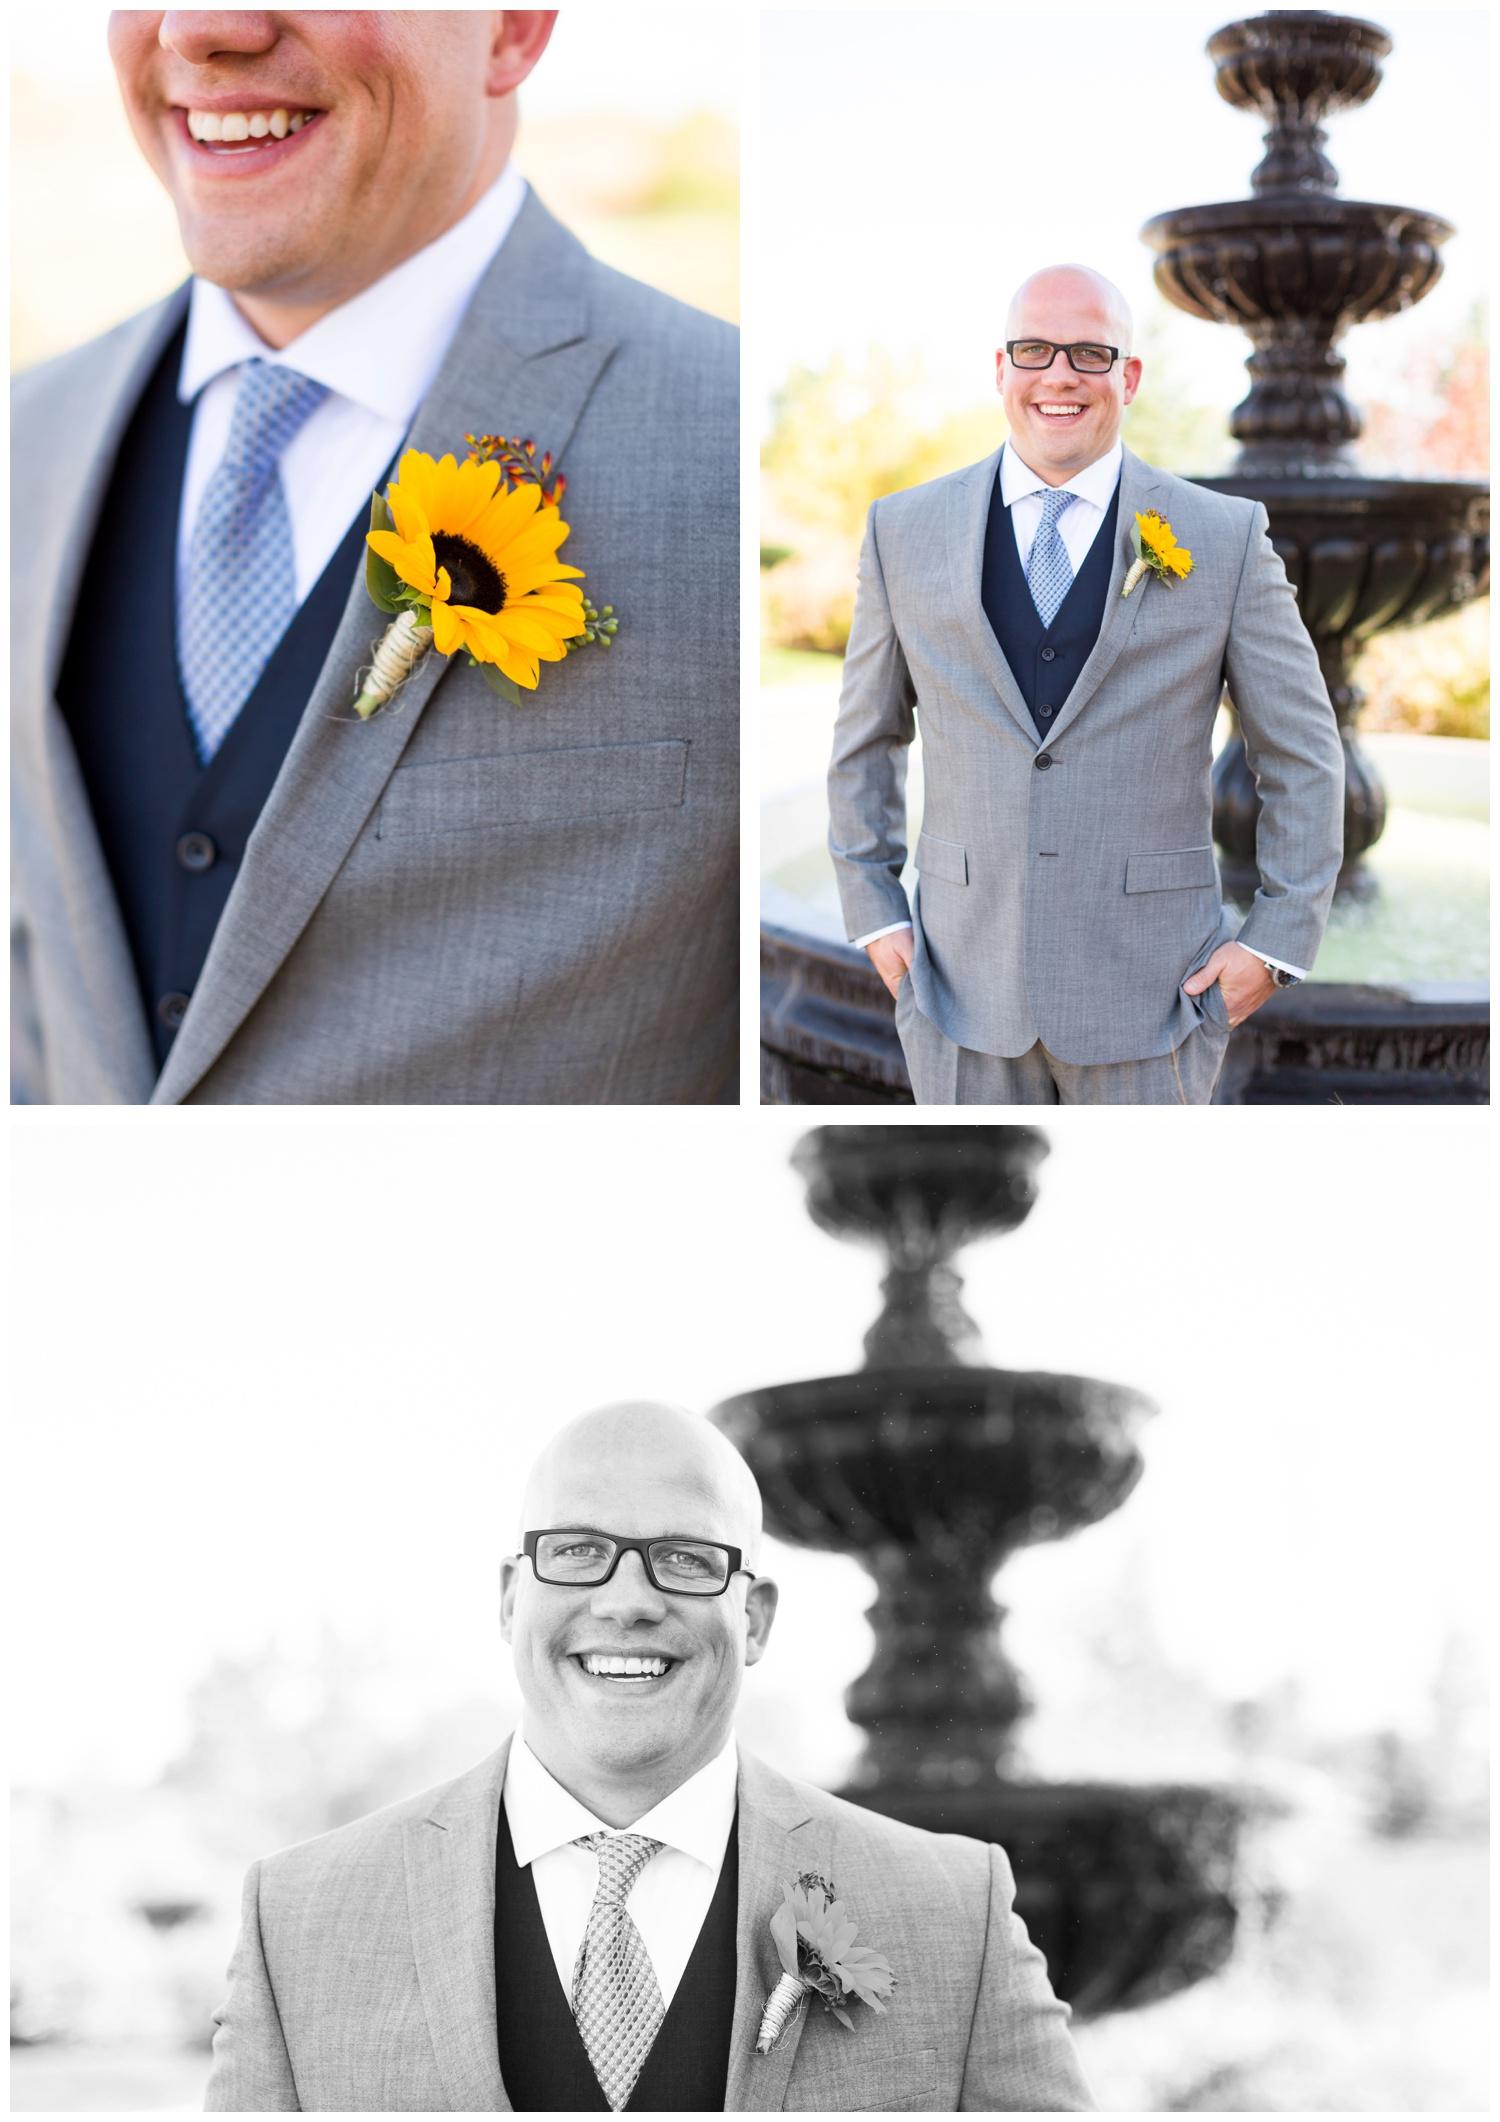 fountains of loveland wedding photography07.jpg